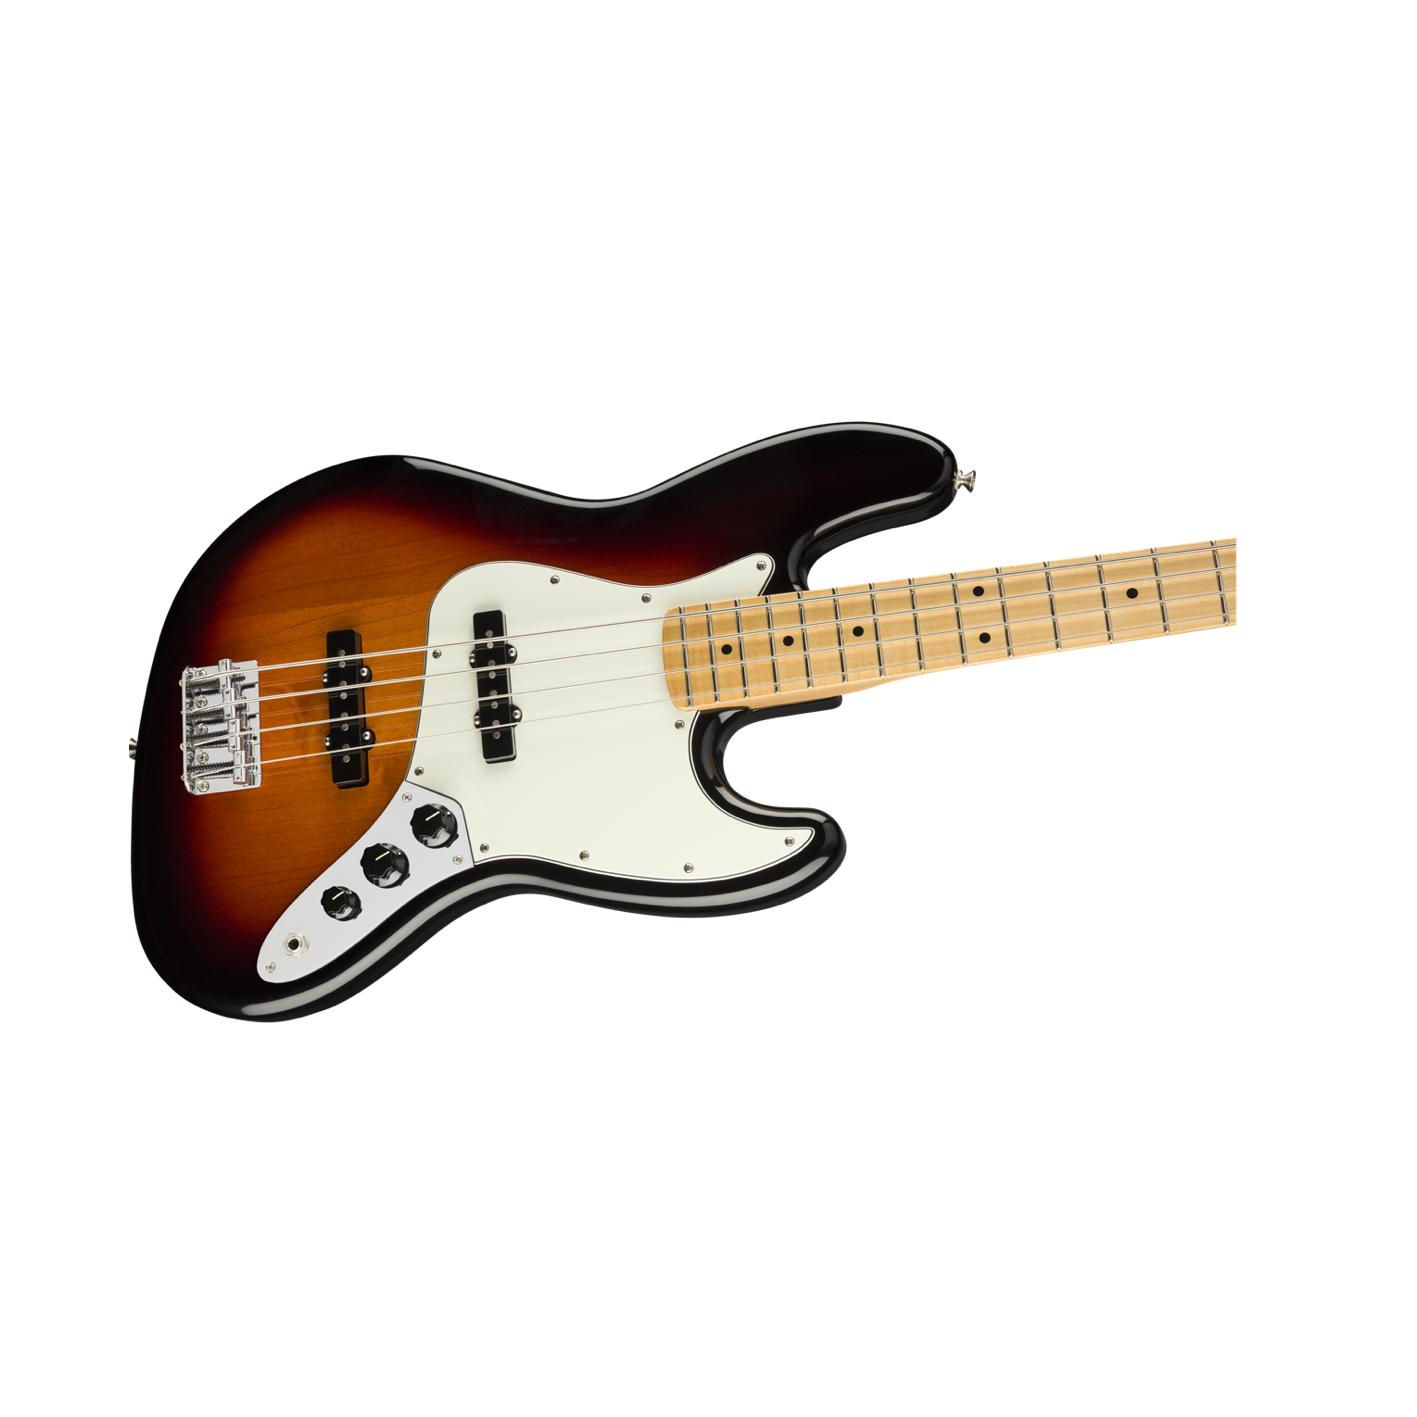 Fender Player Jazz Bass 3 Tone Sunburst